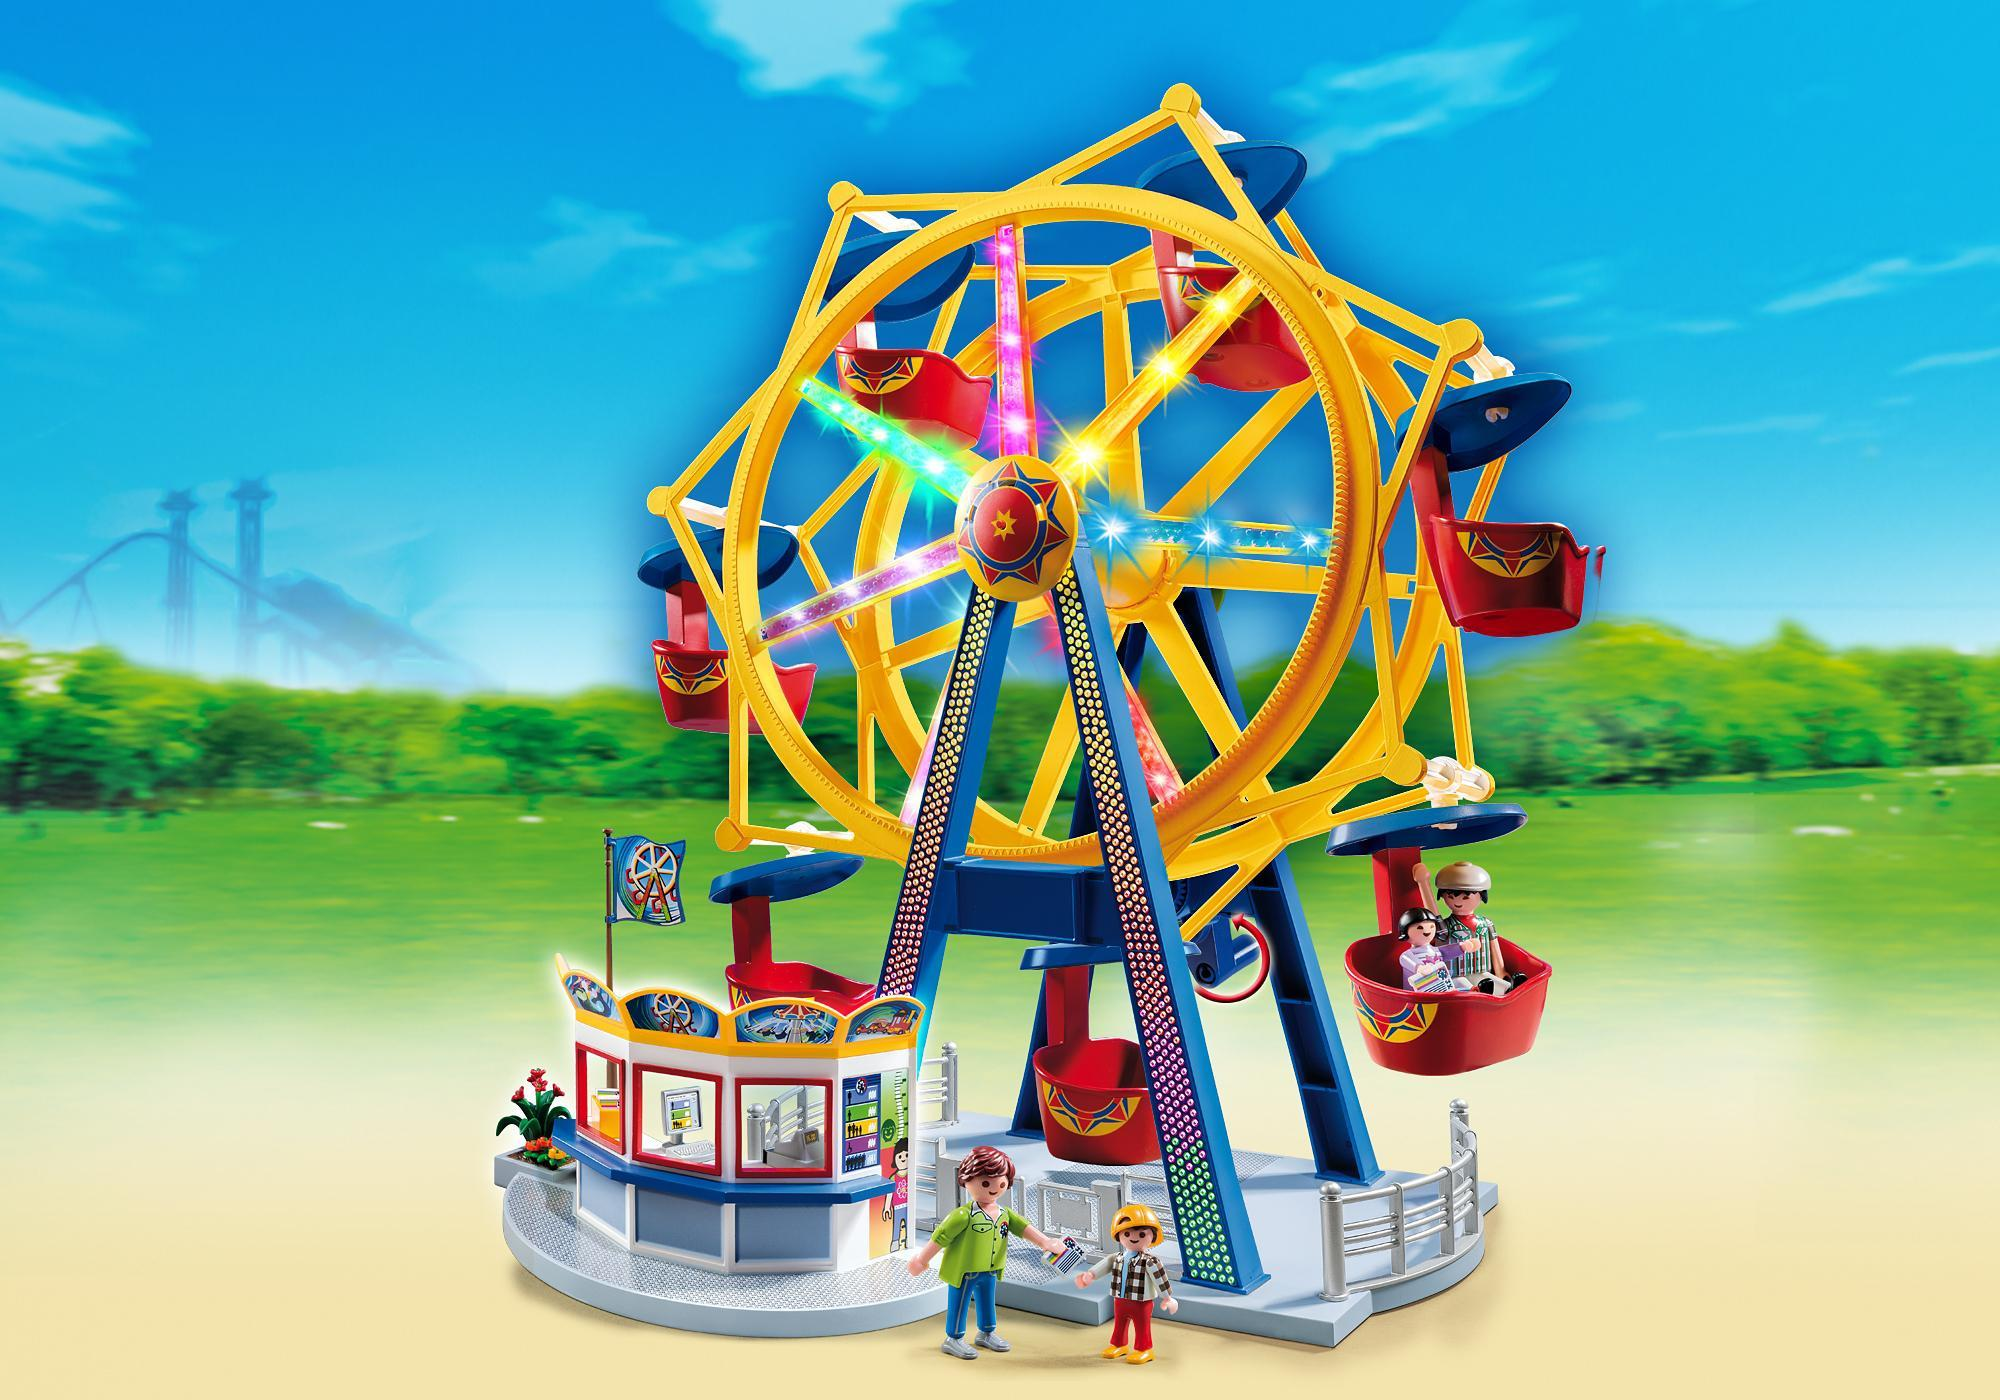 http://media.playmobil.com/i/playmobil/5552_product_detail/Grande roue avec illuminations